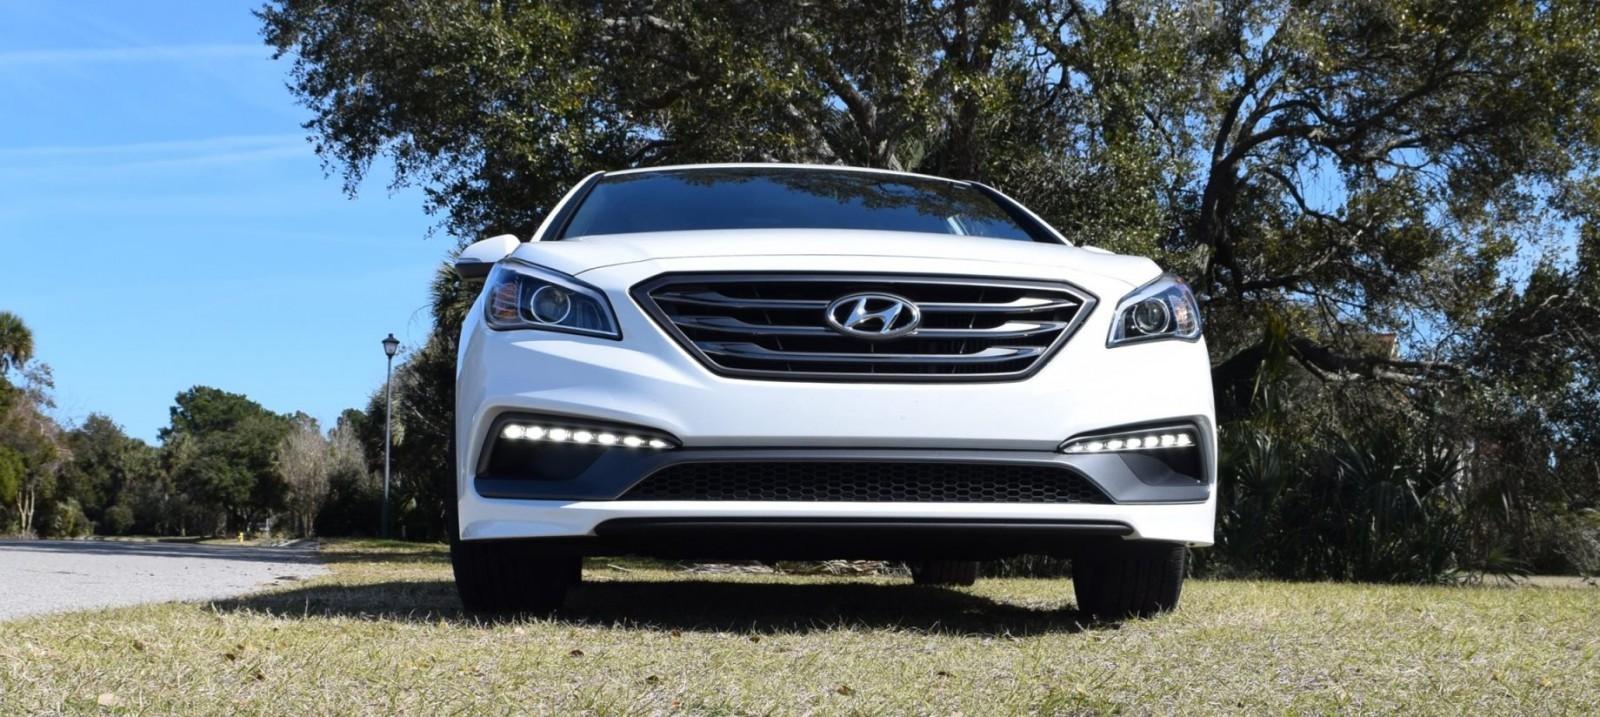 HD Road Test Review - 2016 Hyundai SONATA SPORT 2 0T (+Drive Video